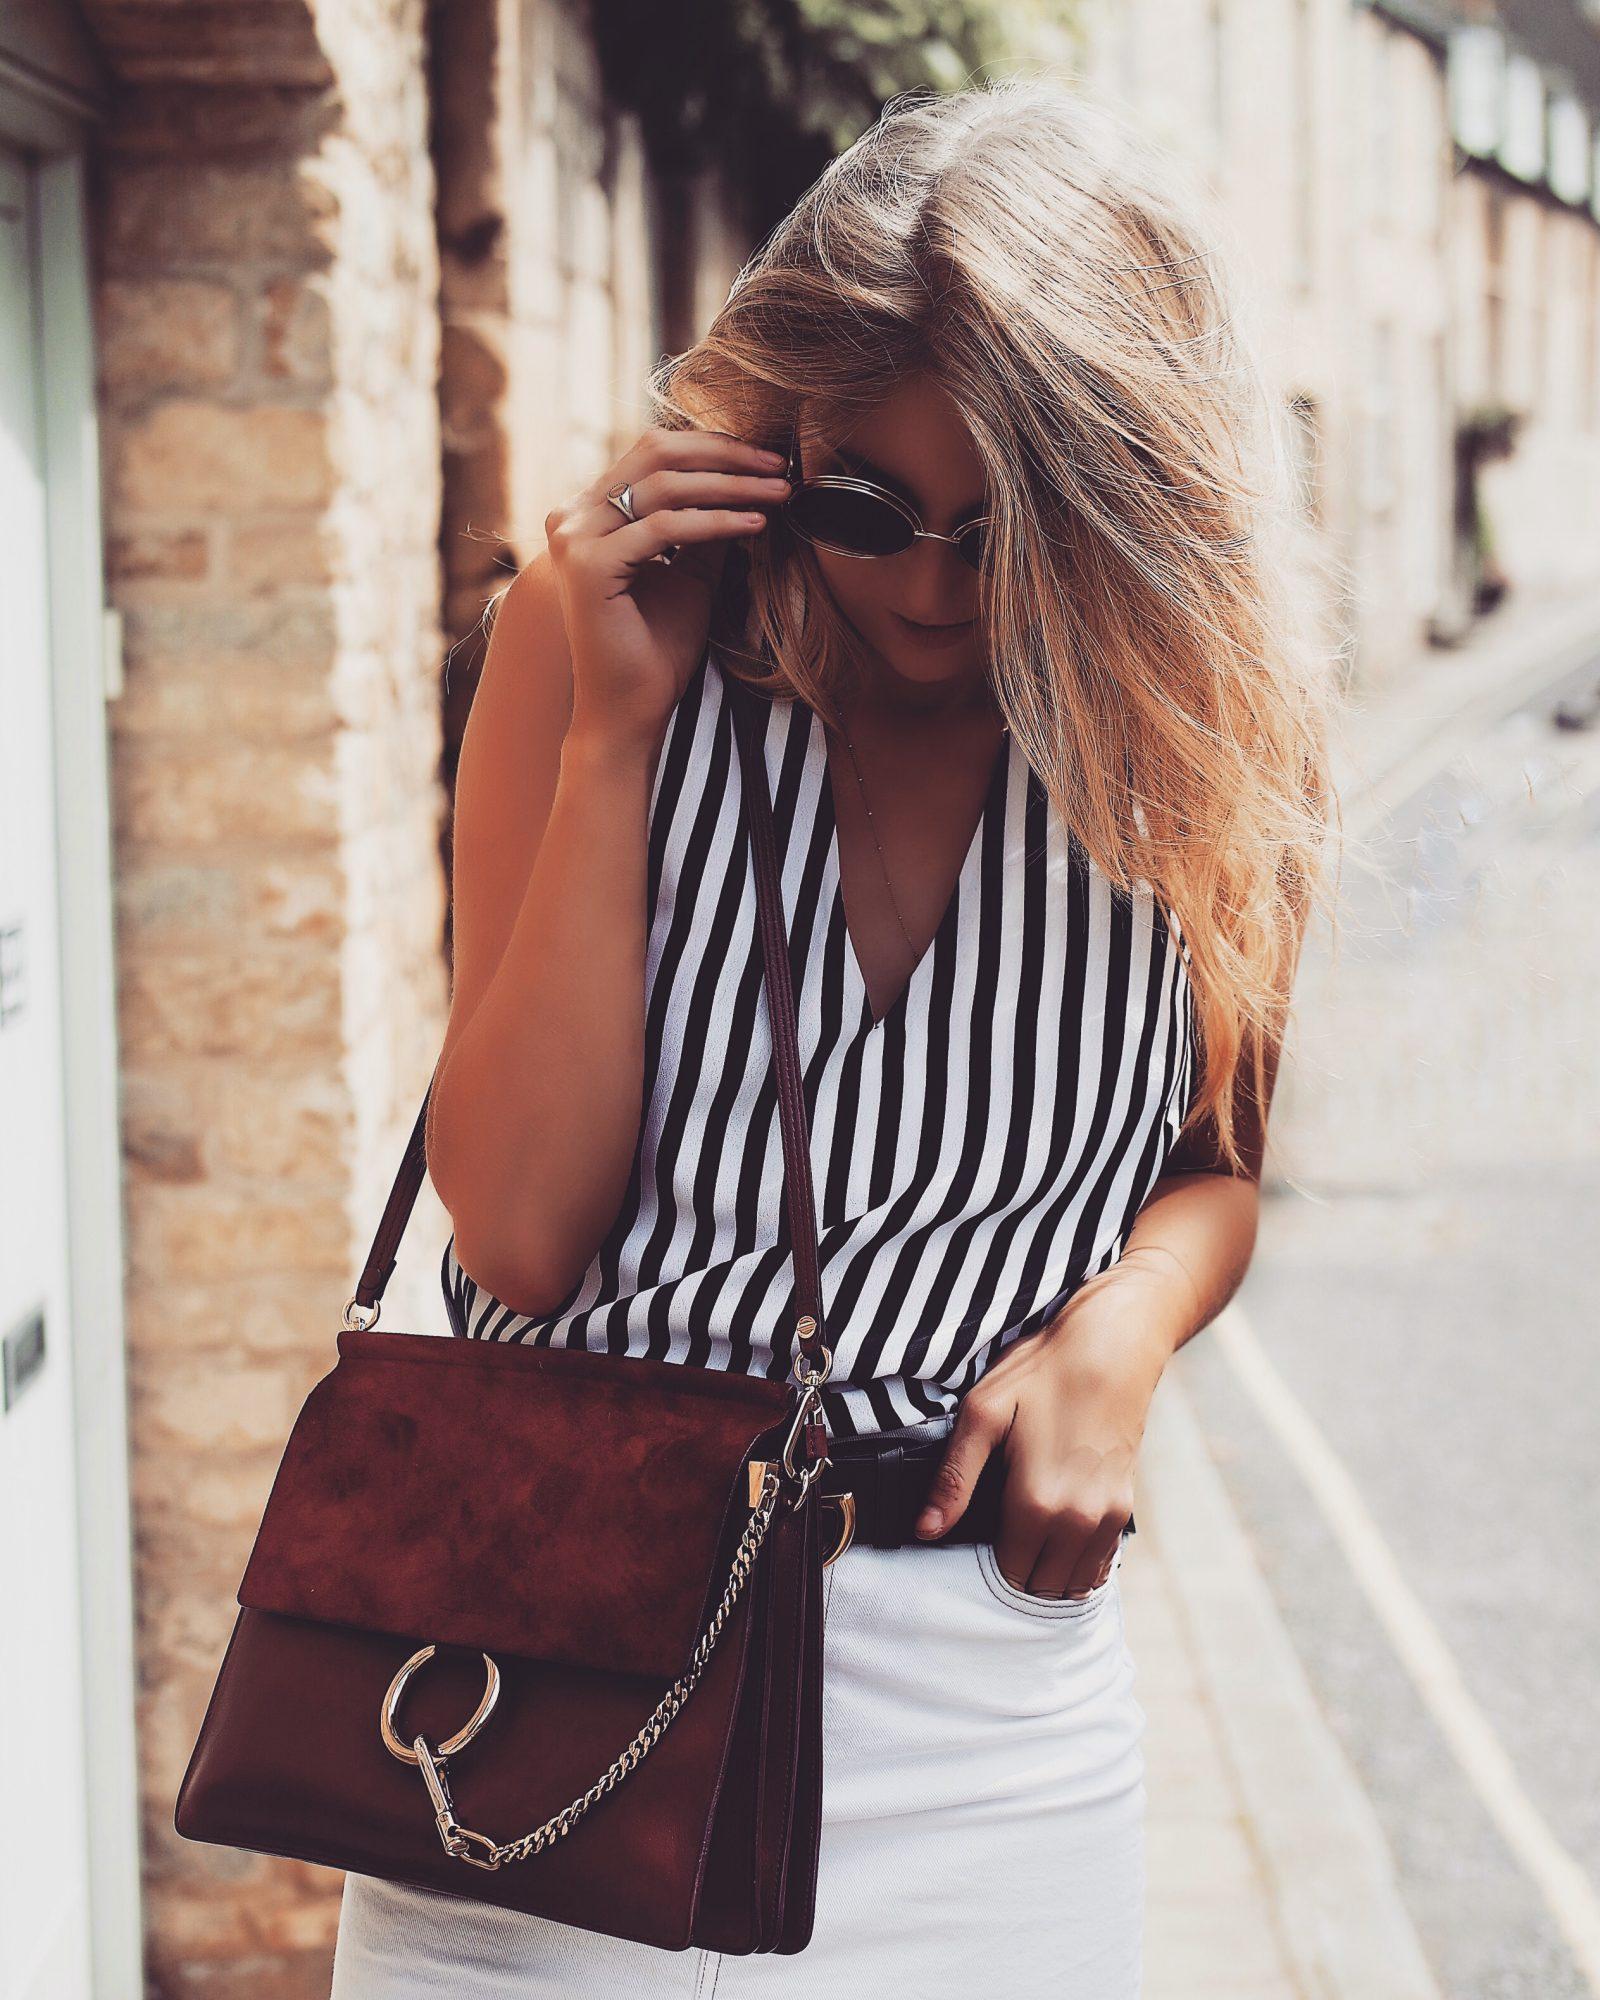 Monochrome Summer Outfit - Burgundy Chloe Faye